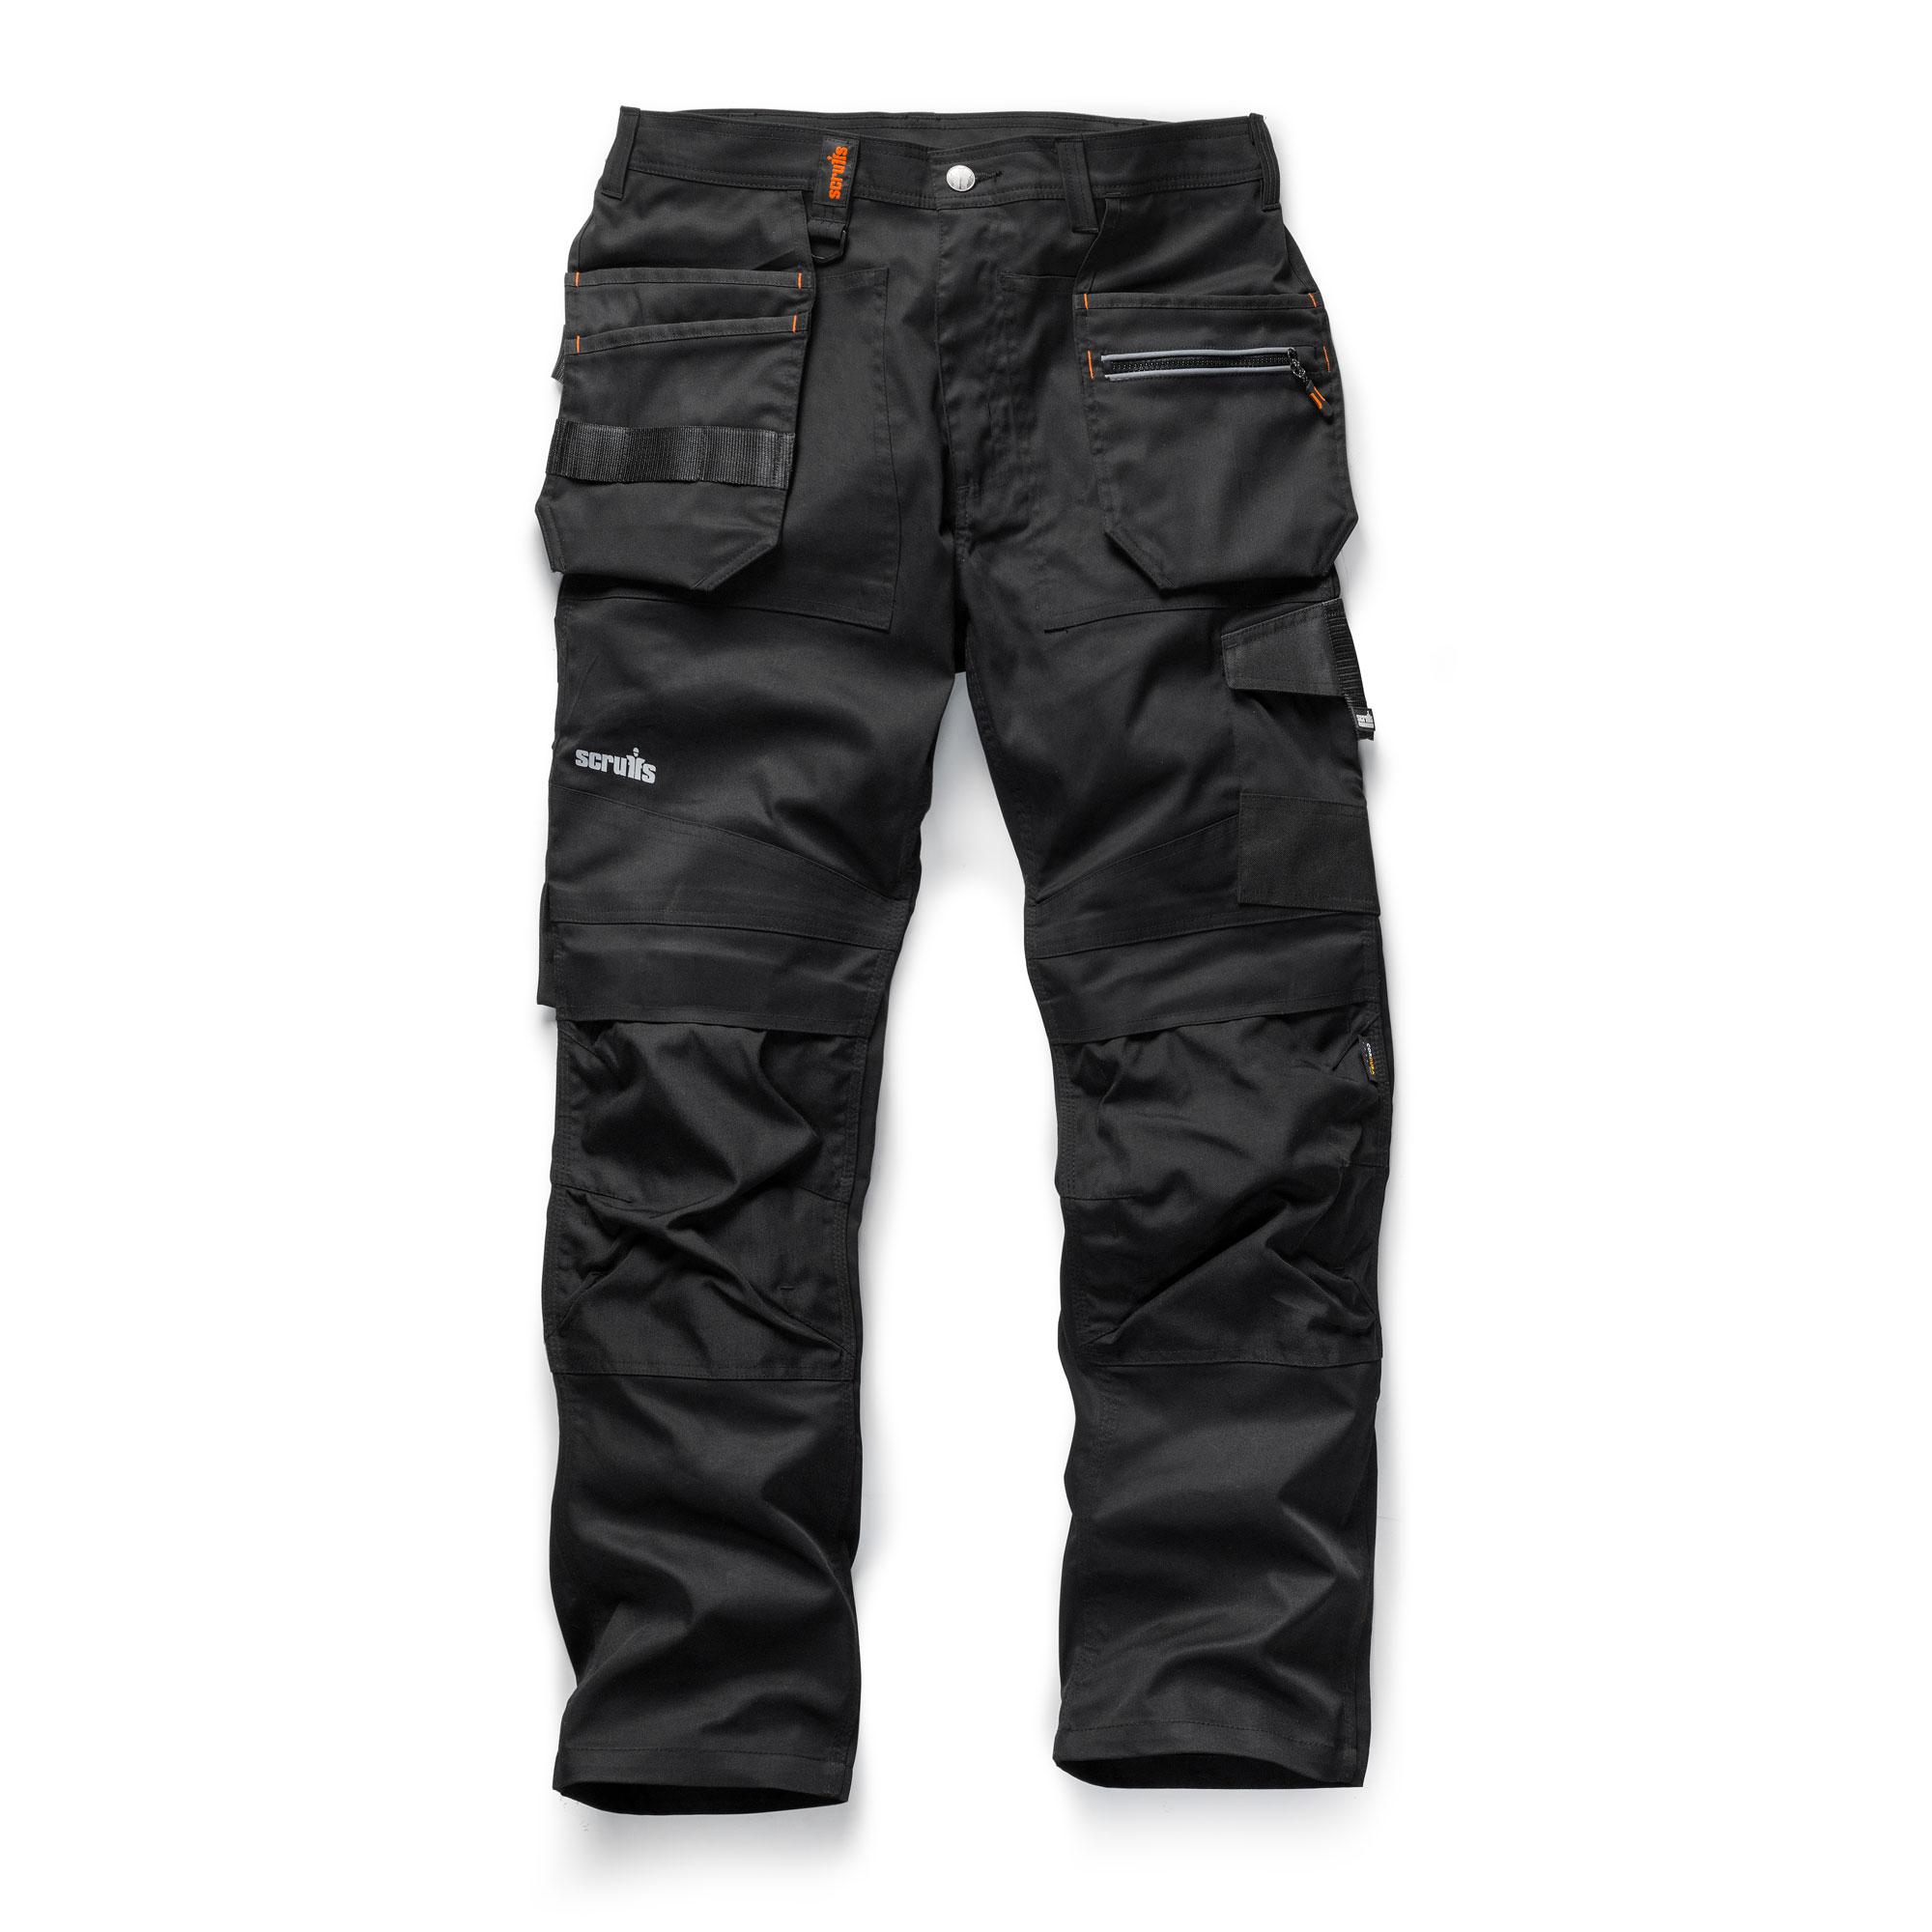 Apache black adjustable stretch woven trouser work belt